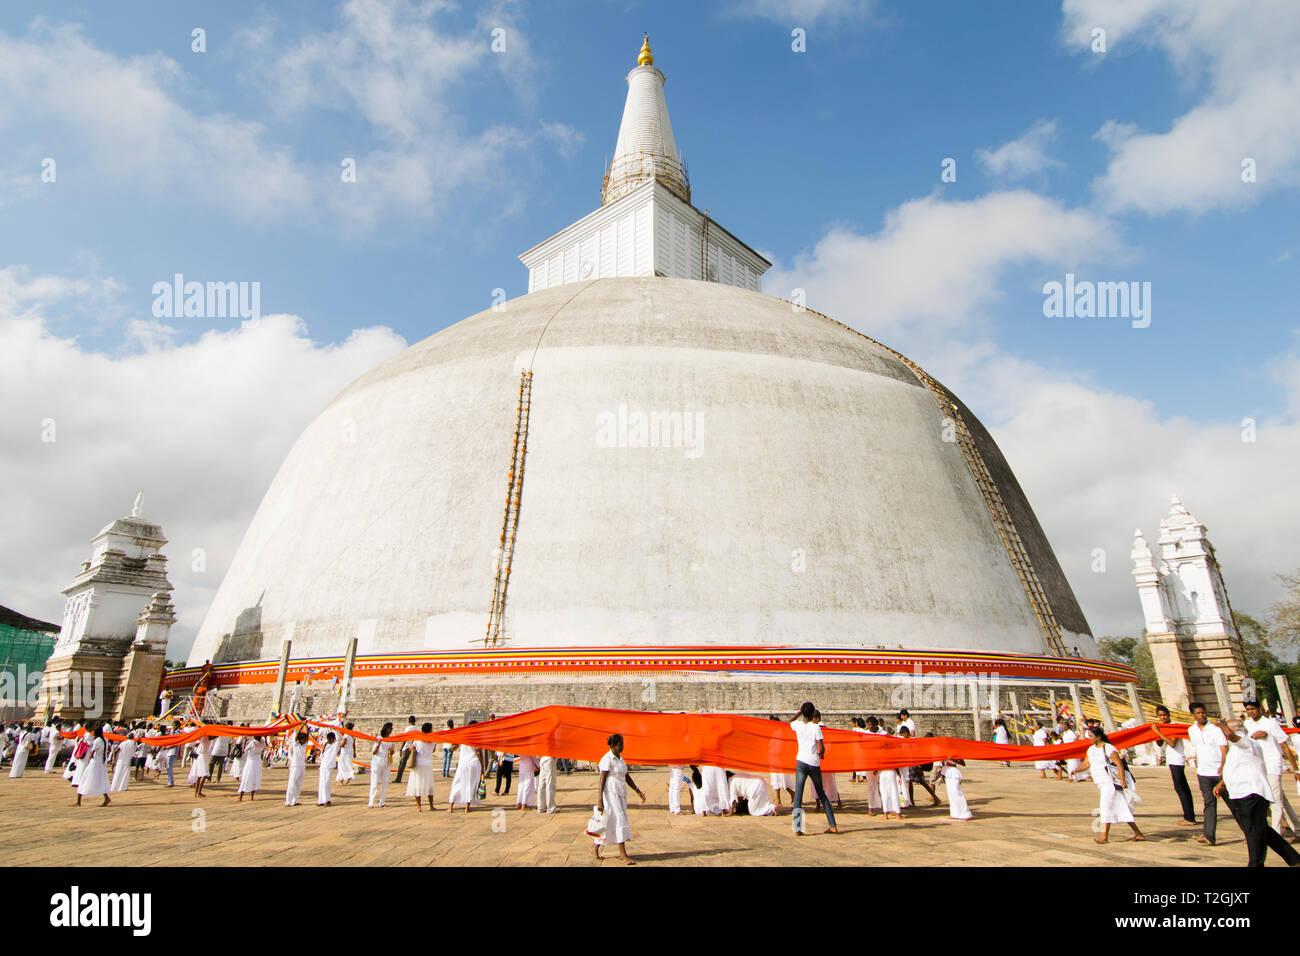 ANURADHAPURA, SRI LANKA - 21 Feb 2016: A procession of people dressed in white wraps a 366 meter-long orange cloth around the Ruwanwelisaya stupa for  - Stock Image